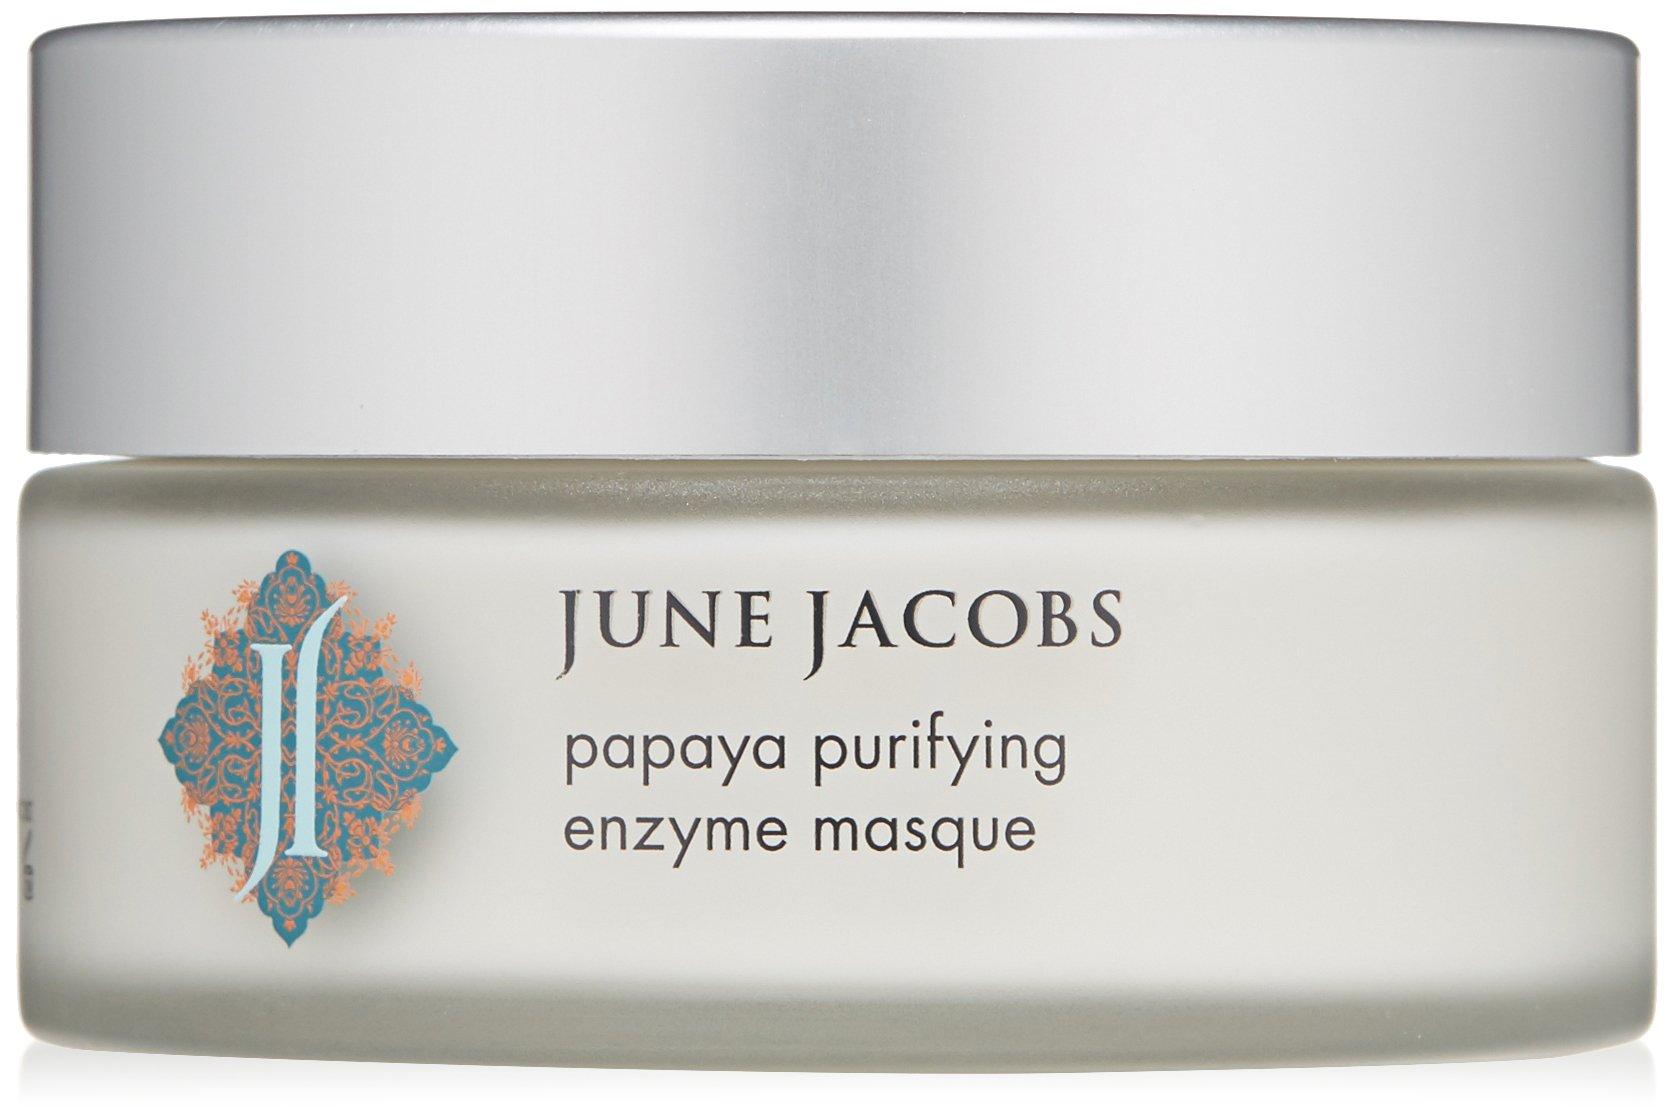 June Jacobs Papaya Purifying Enzyme Masque, 4 Fl Oz